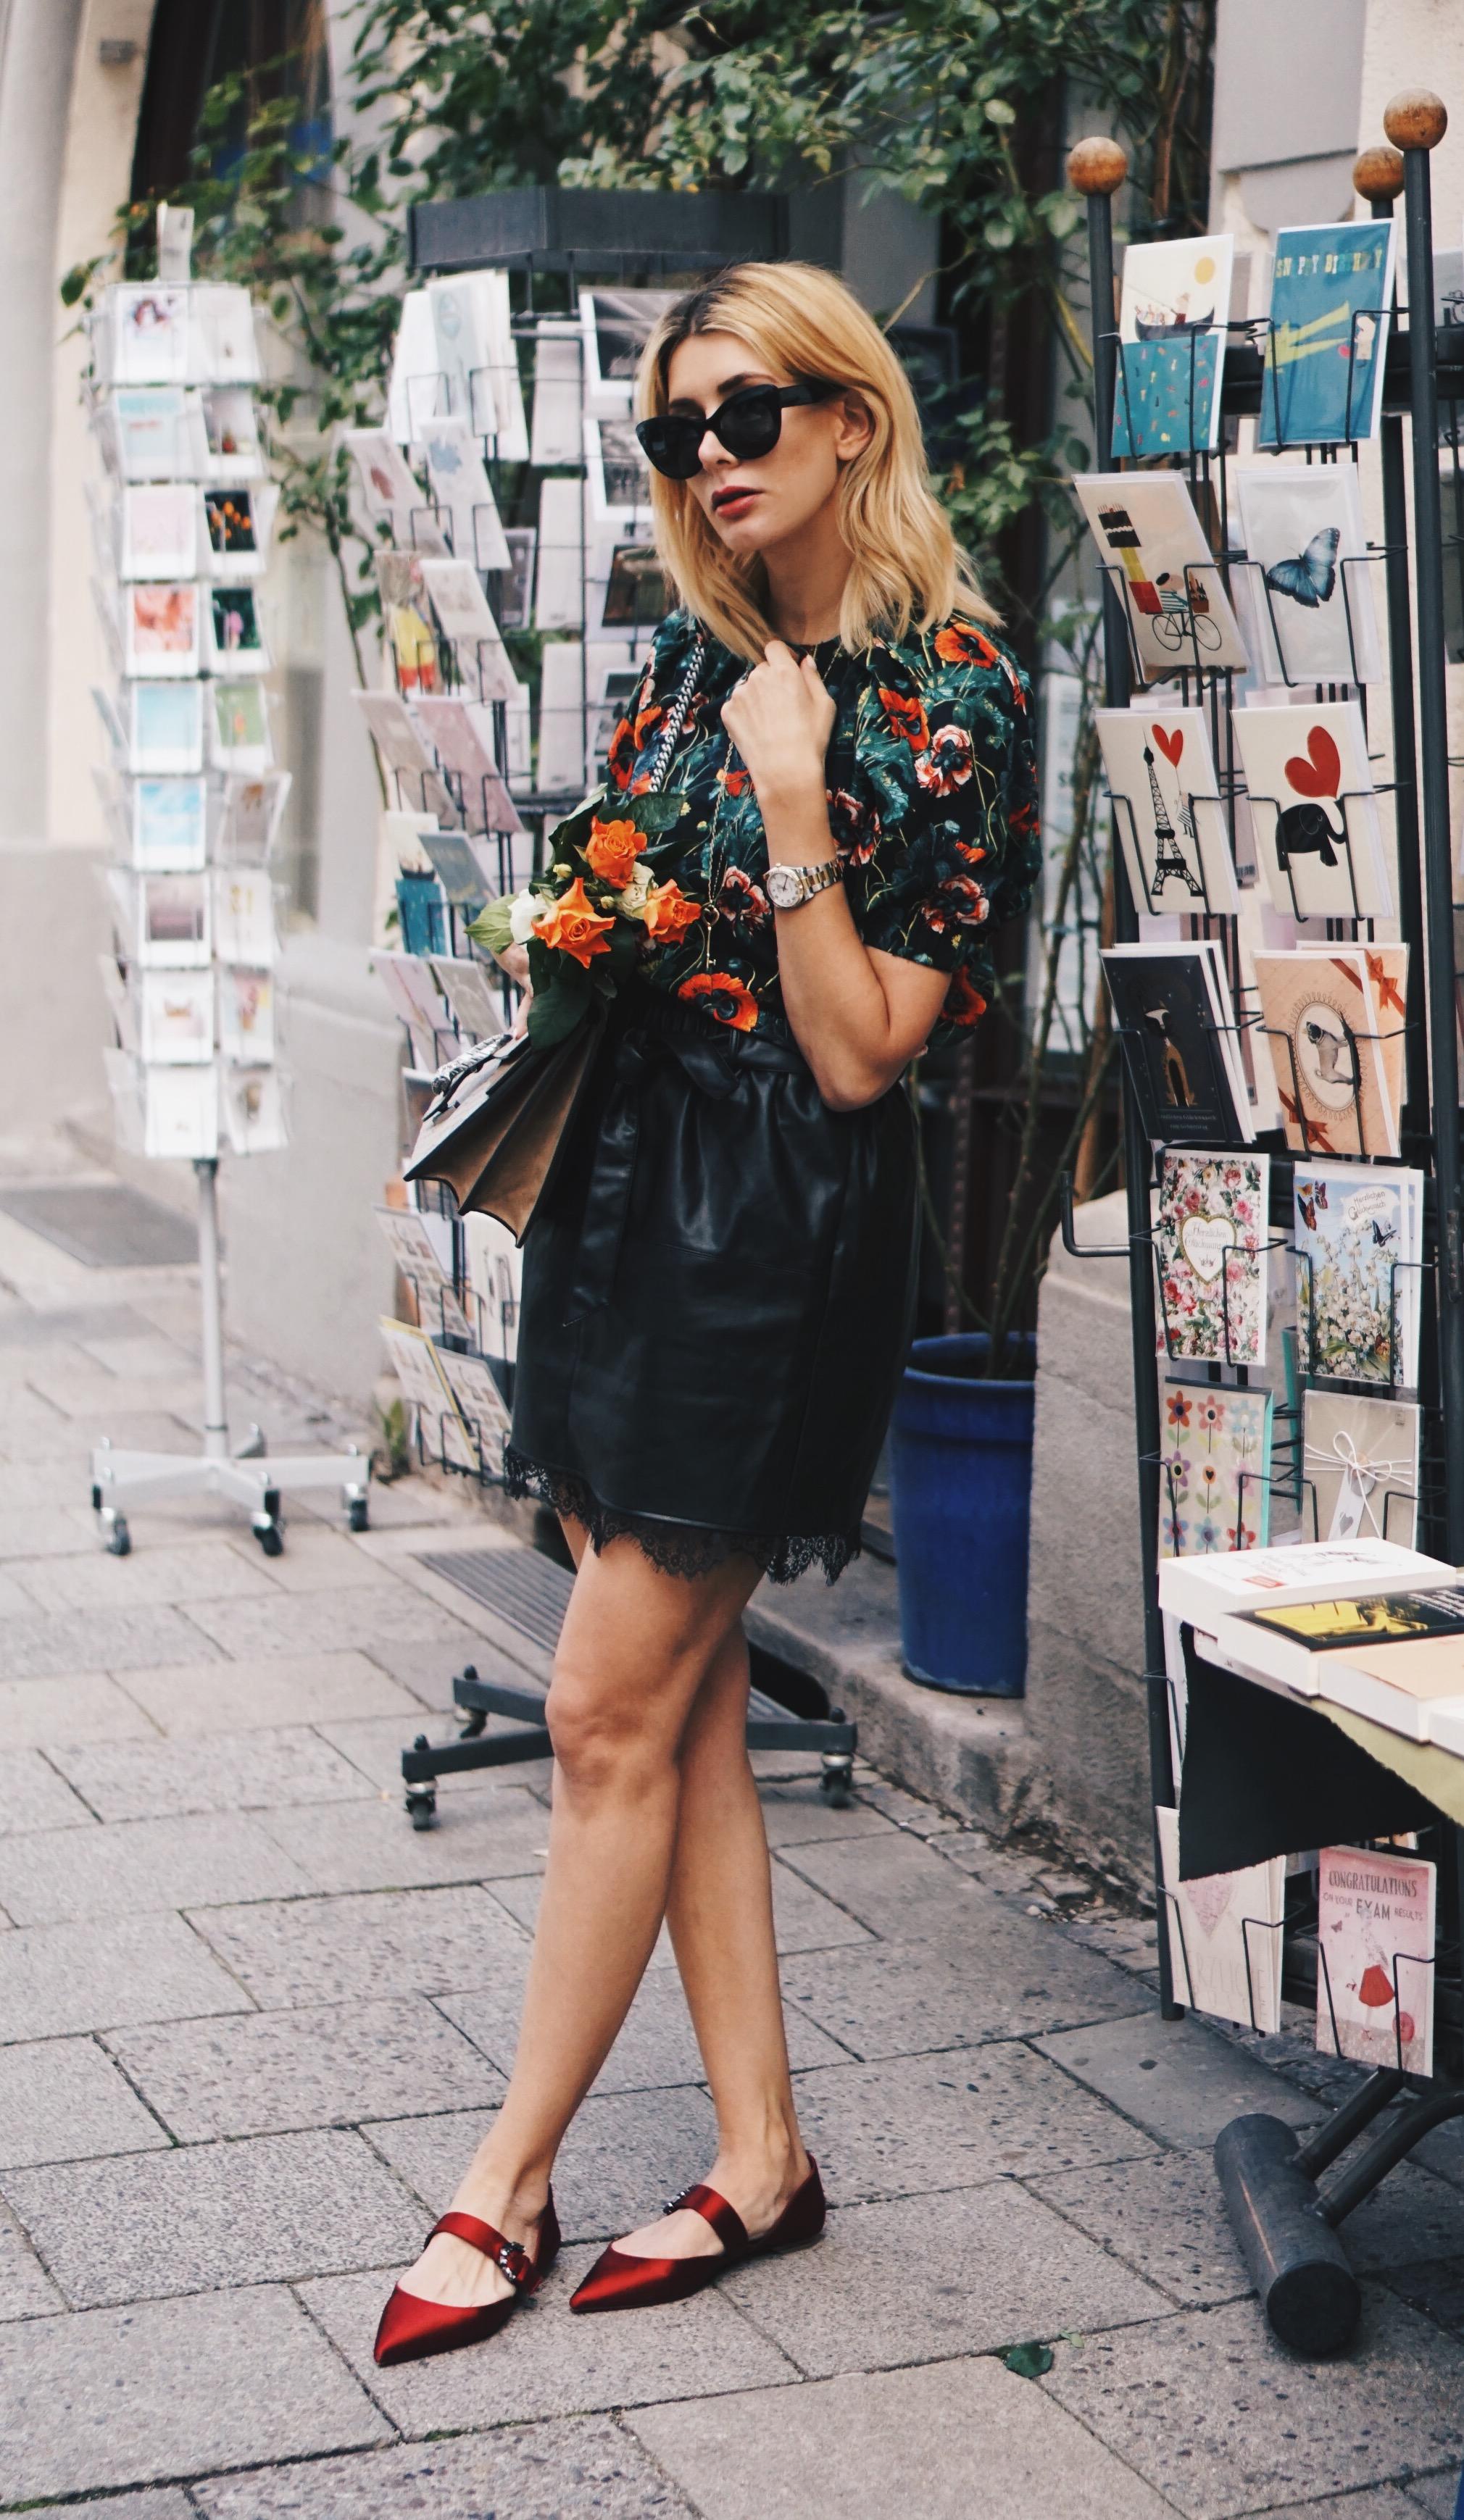 Lederrock und Bluse mit Blumenprint